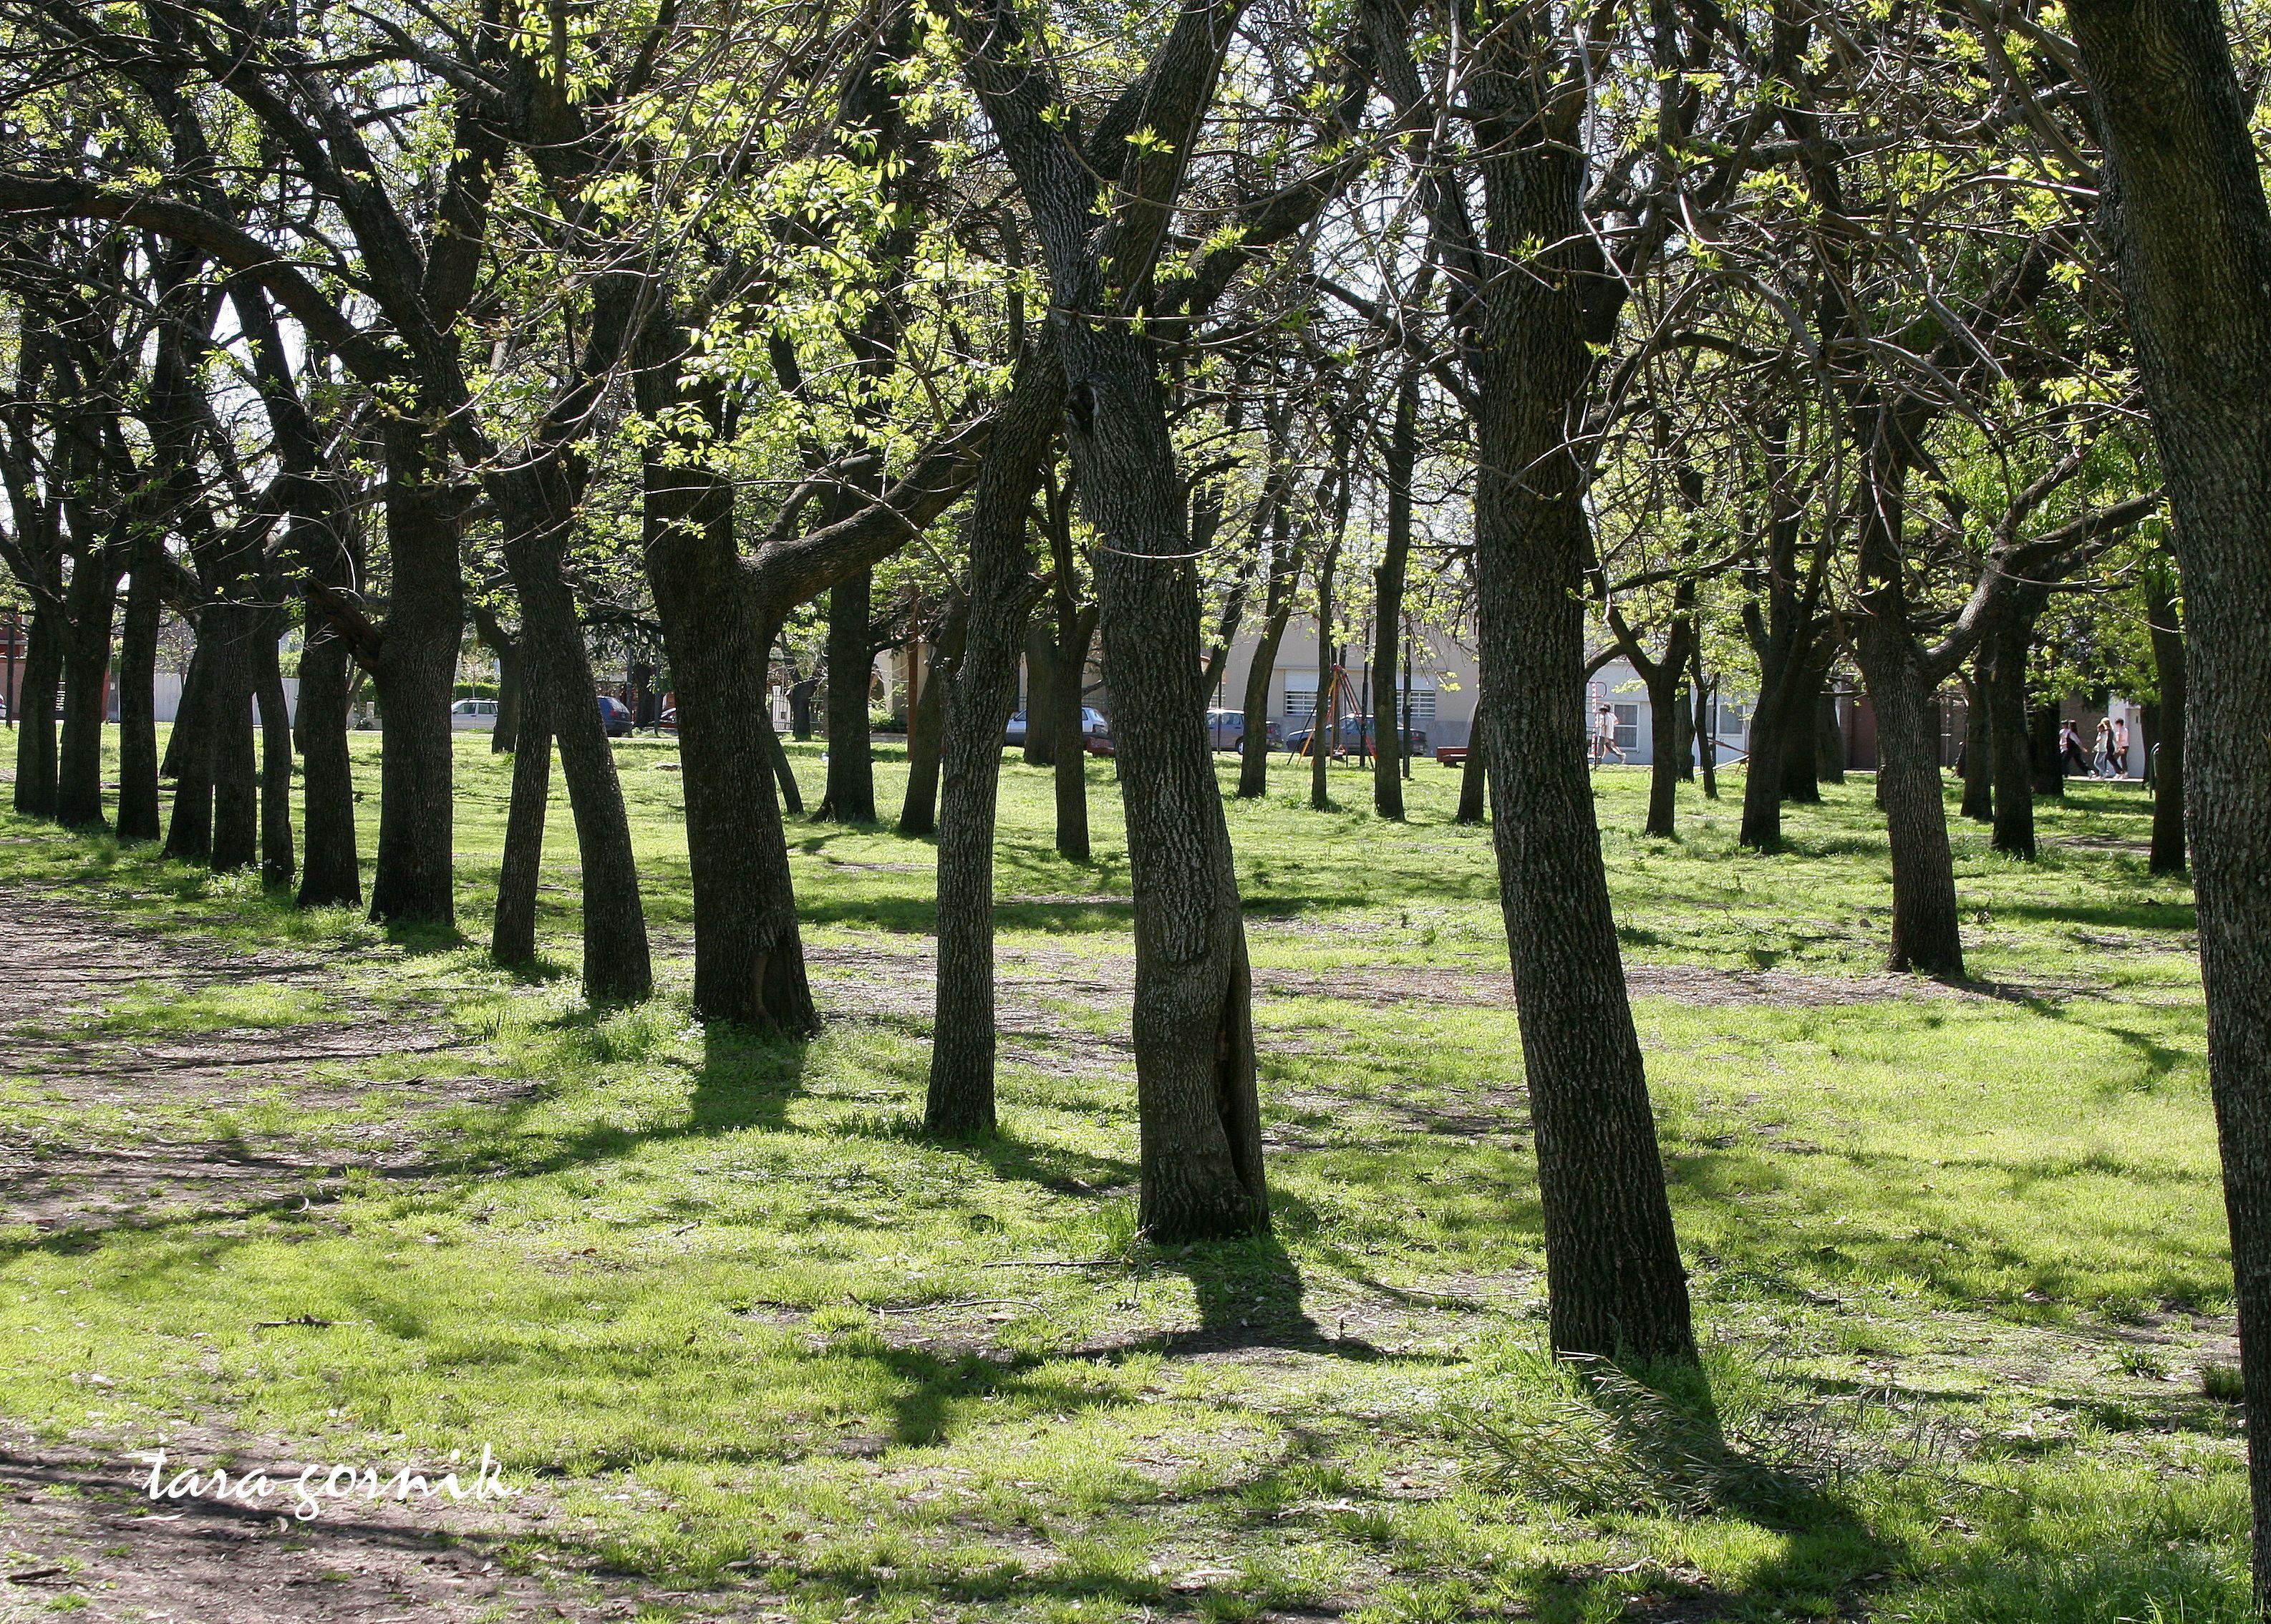 Perceptive Perspective Landscapes Landscape Perspective Patterns In Nature